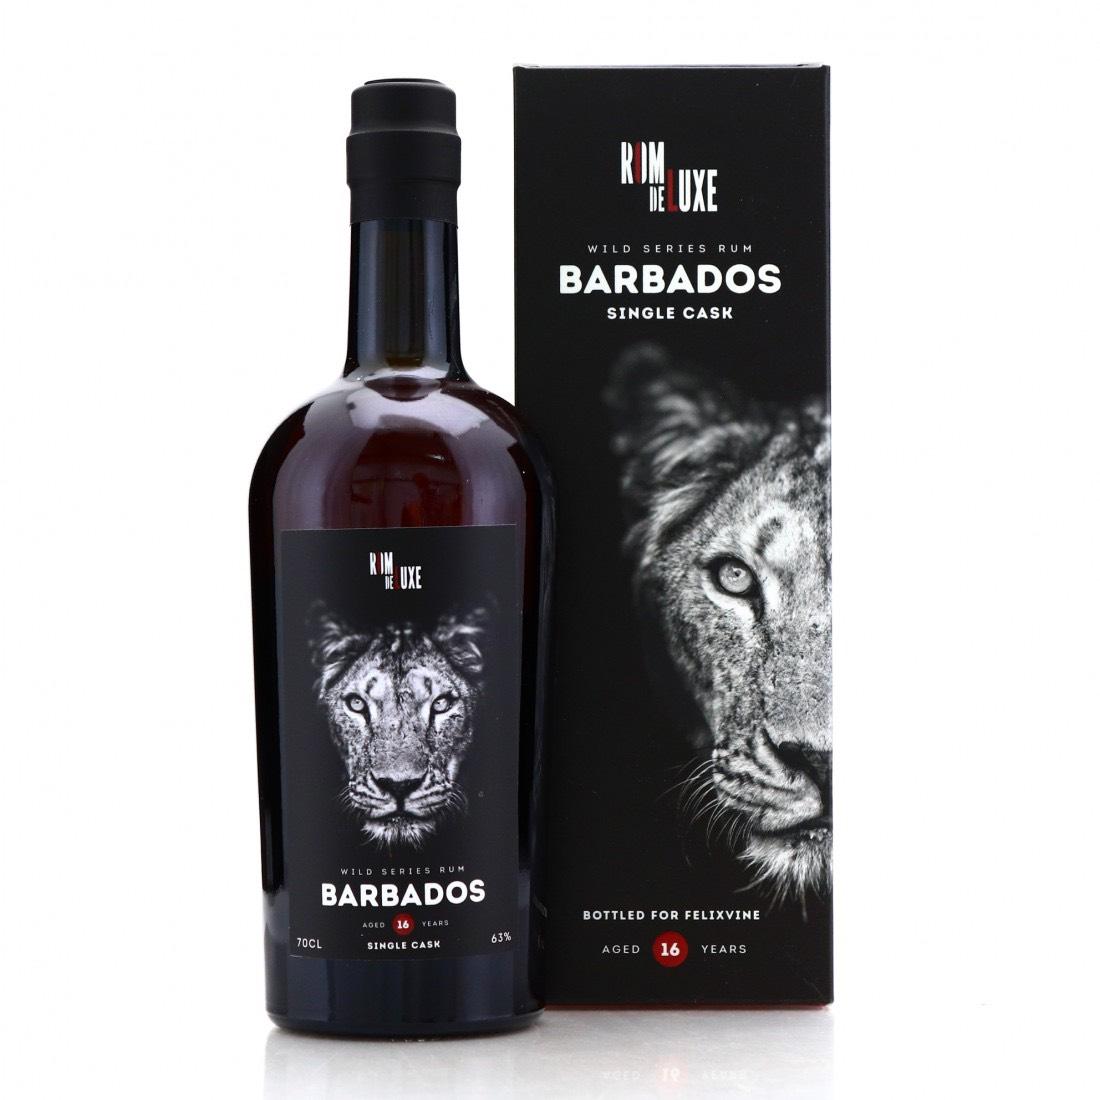 Bottle image of Wild Series Rum Barbados